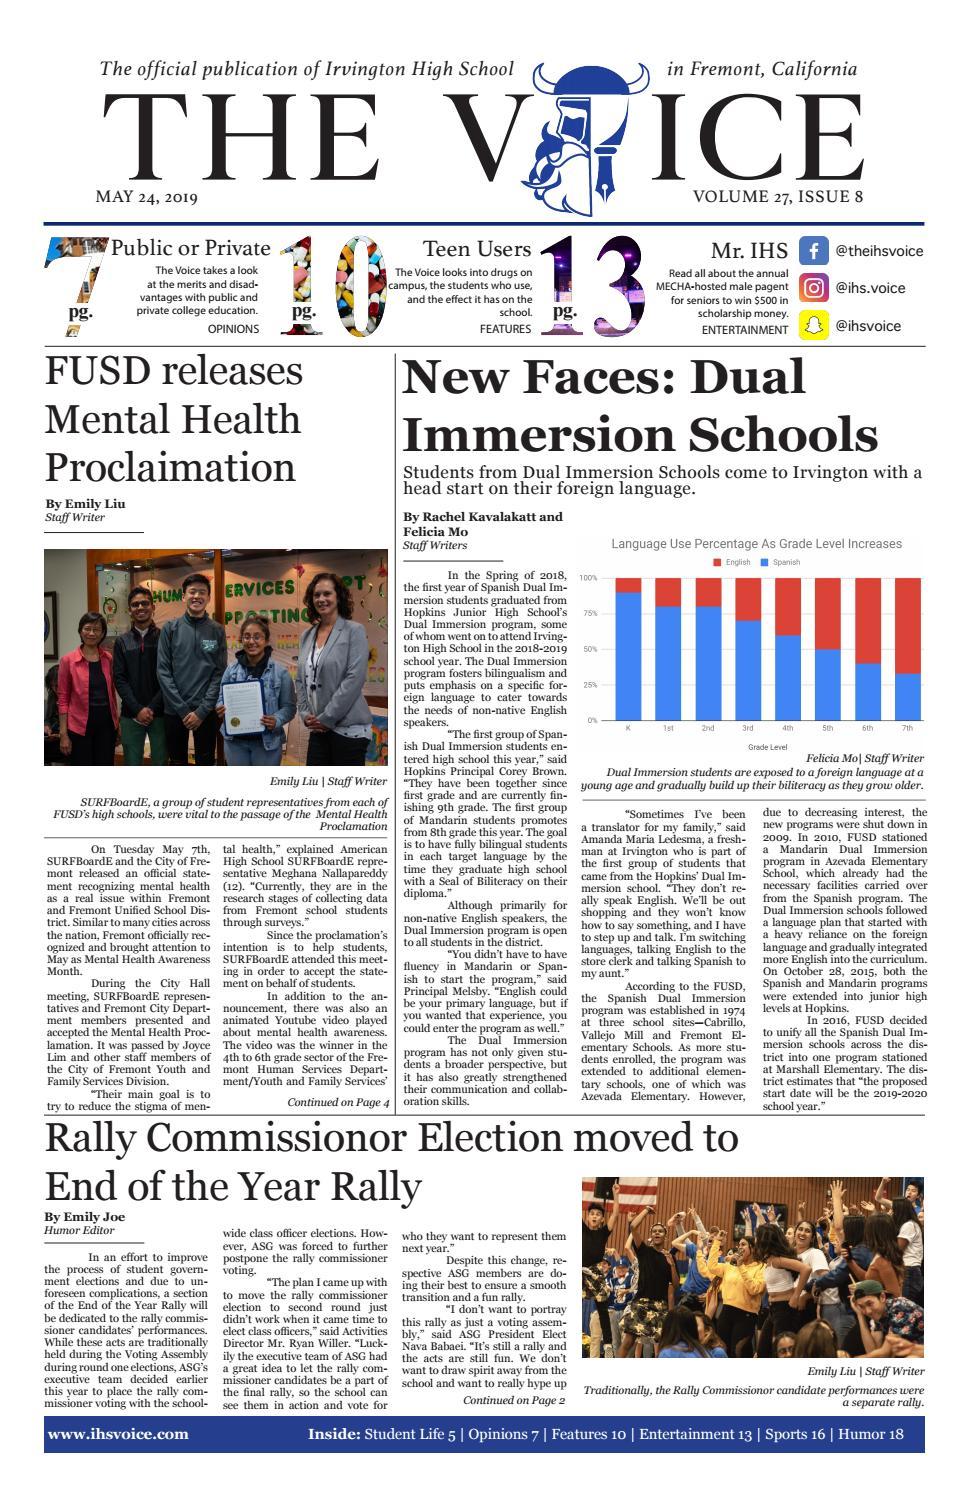 Irvington Voice 27 8 by The Irvington Voice - issuu